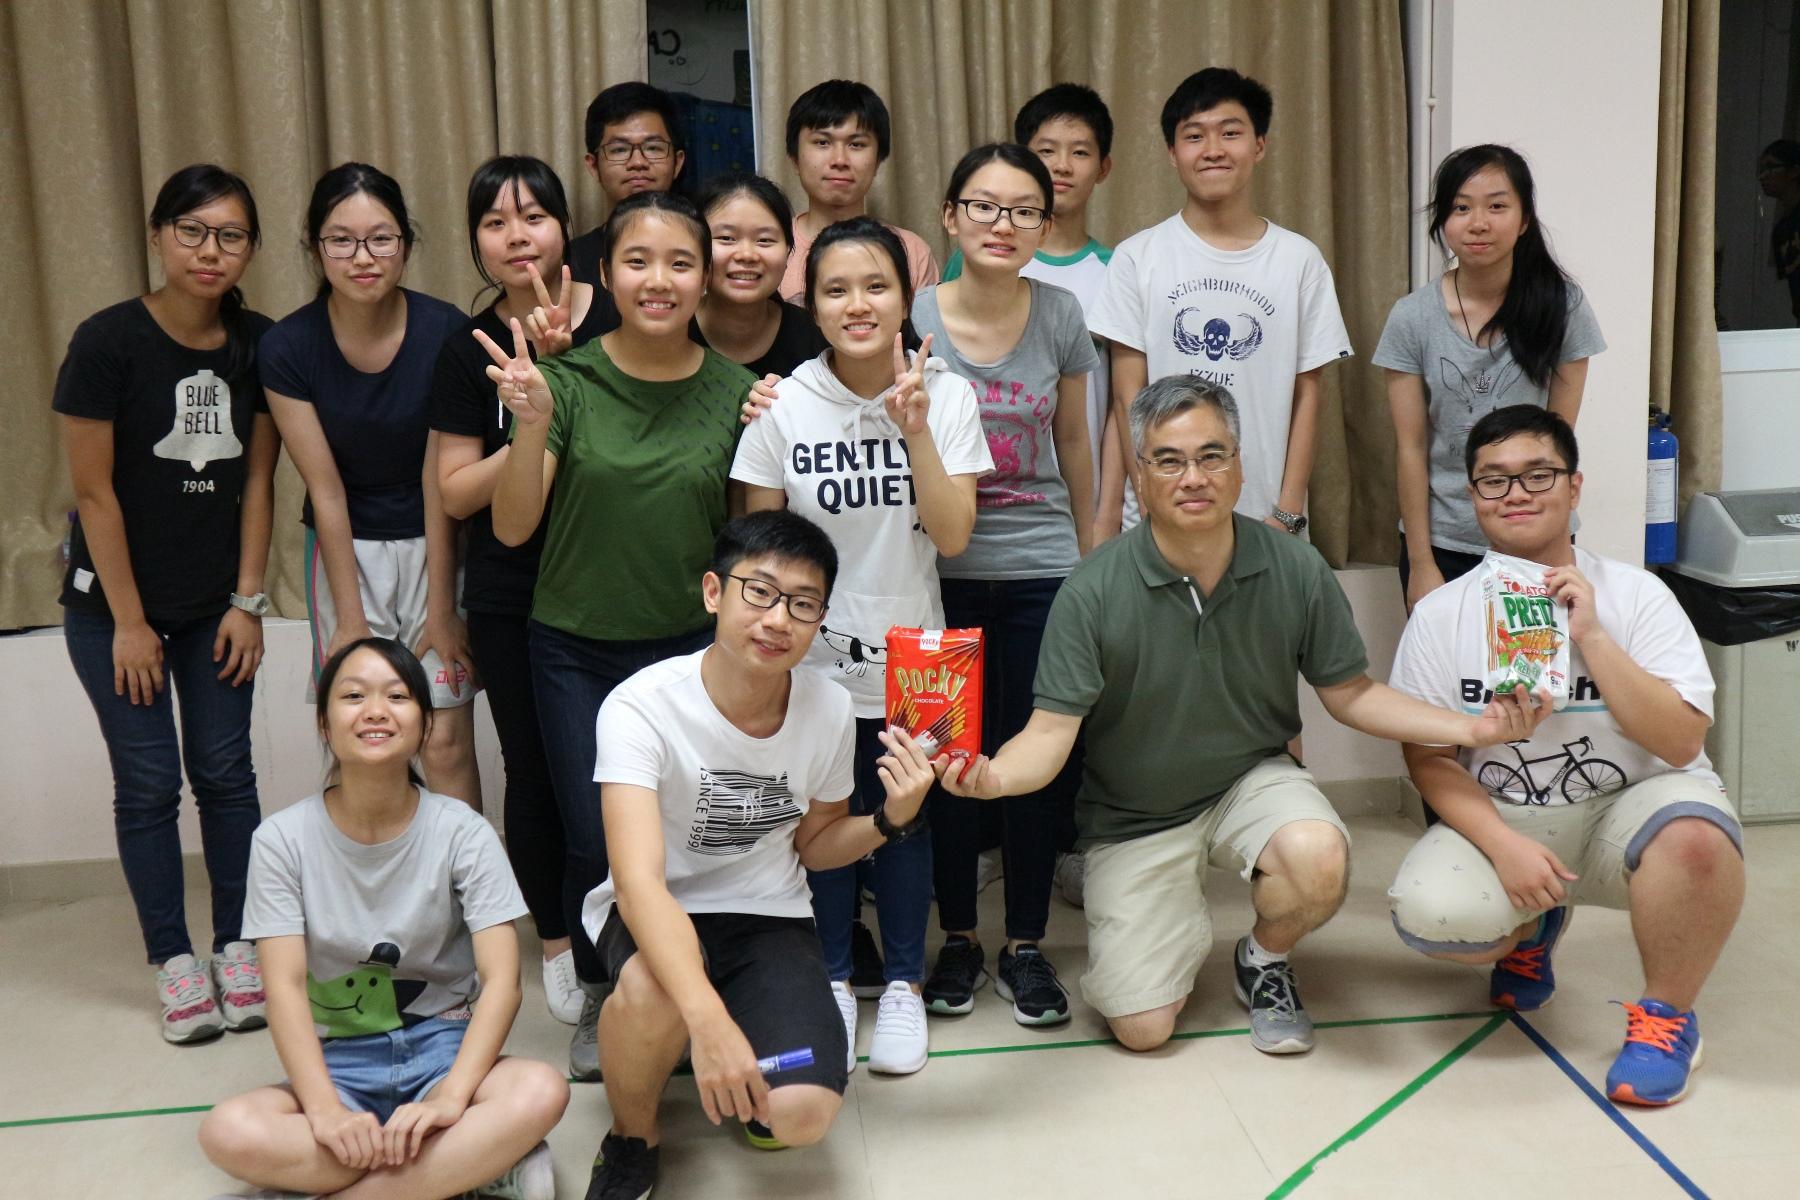 http://www.npc.edu.hk/sites/default/files/img_3299.jpg